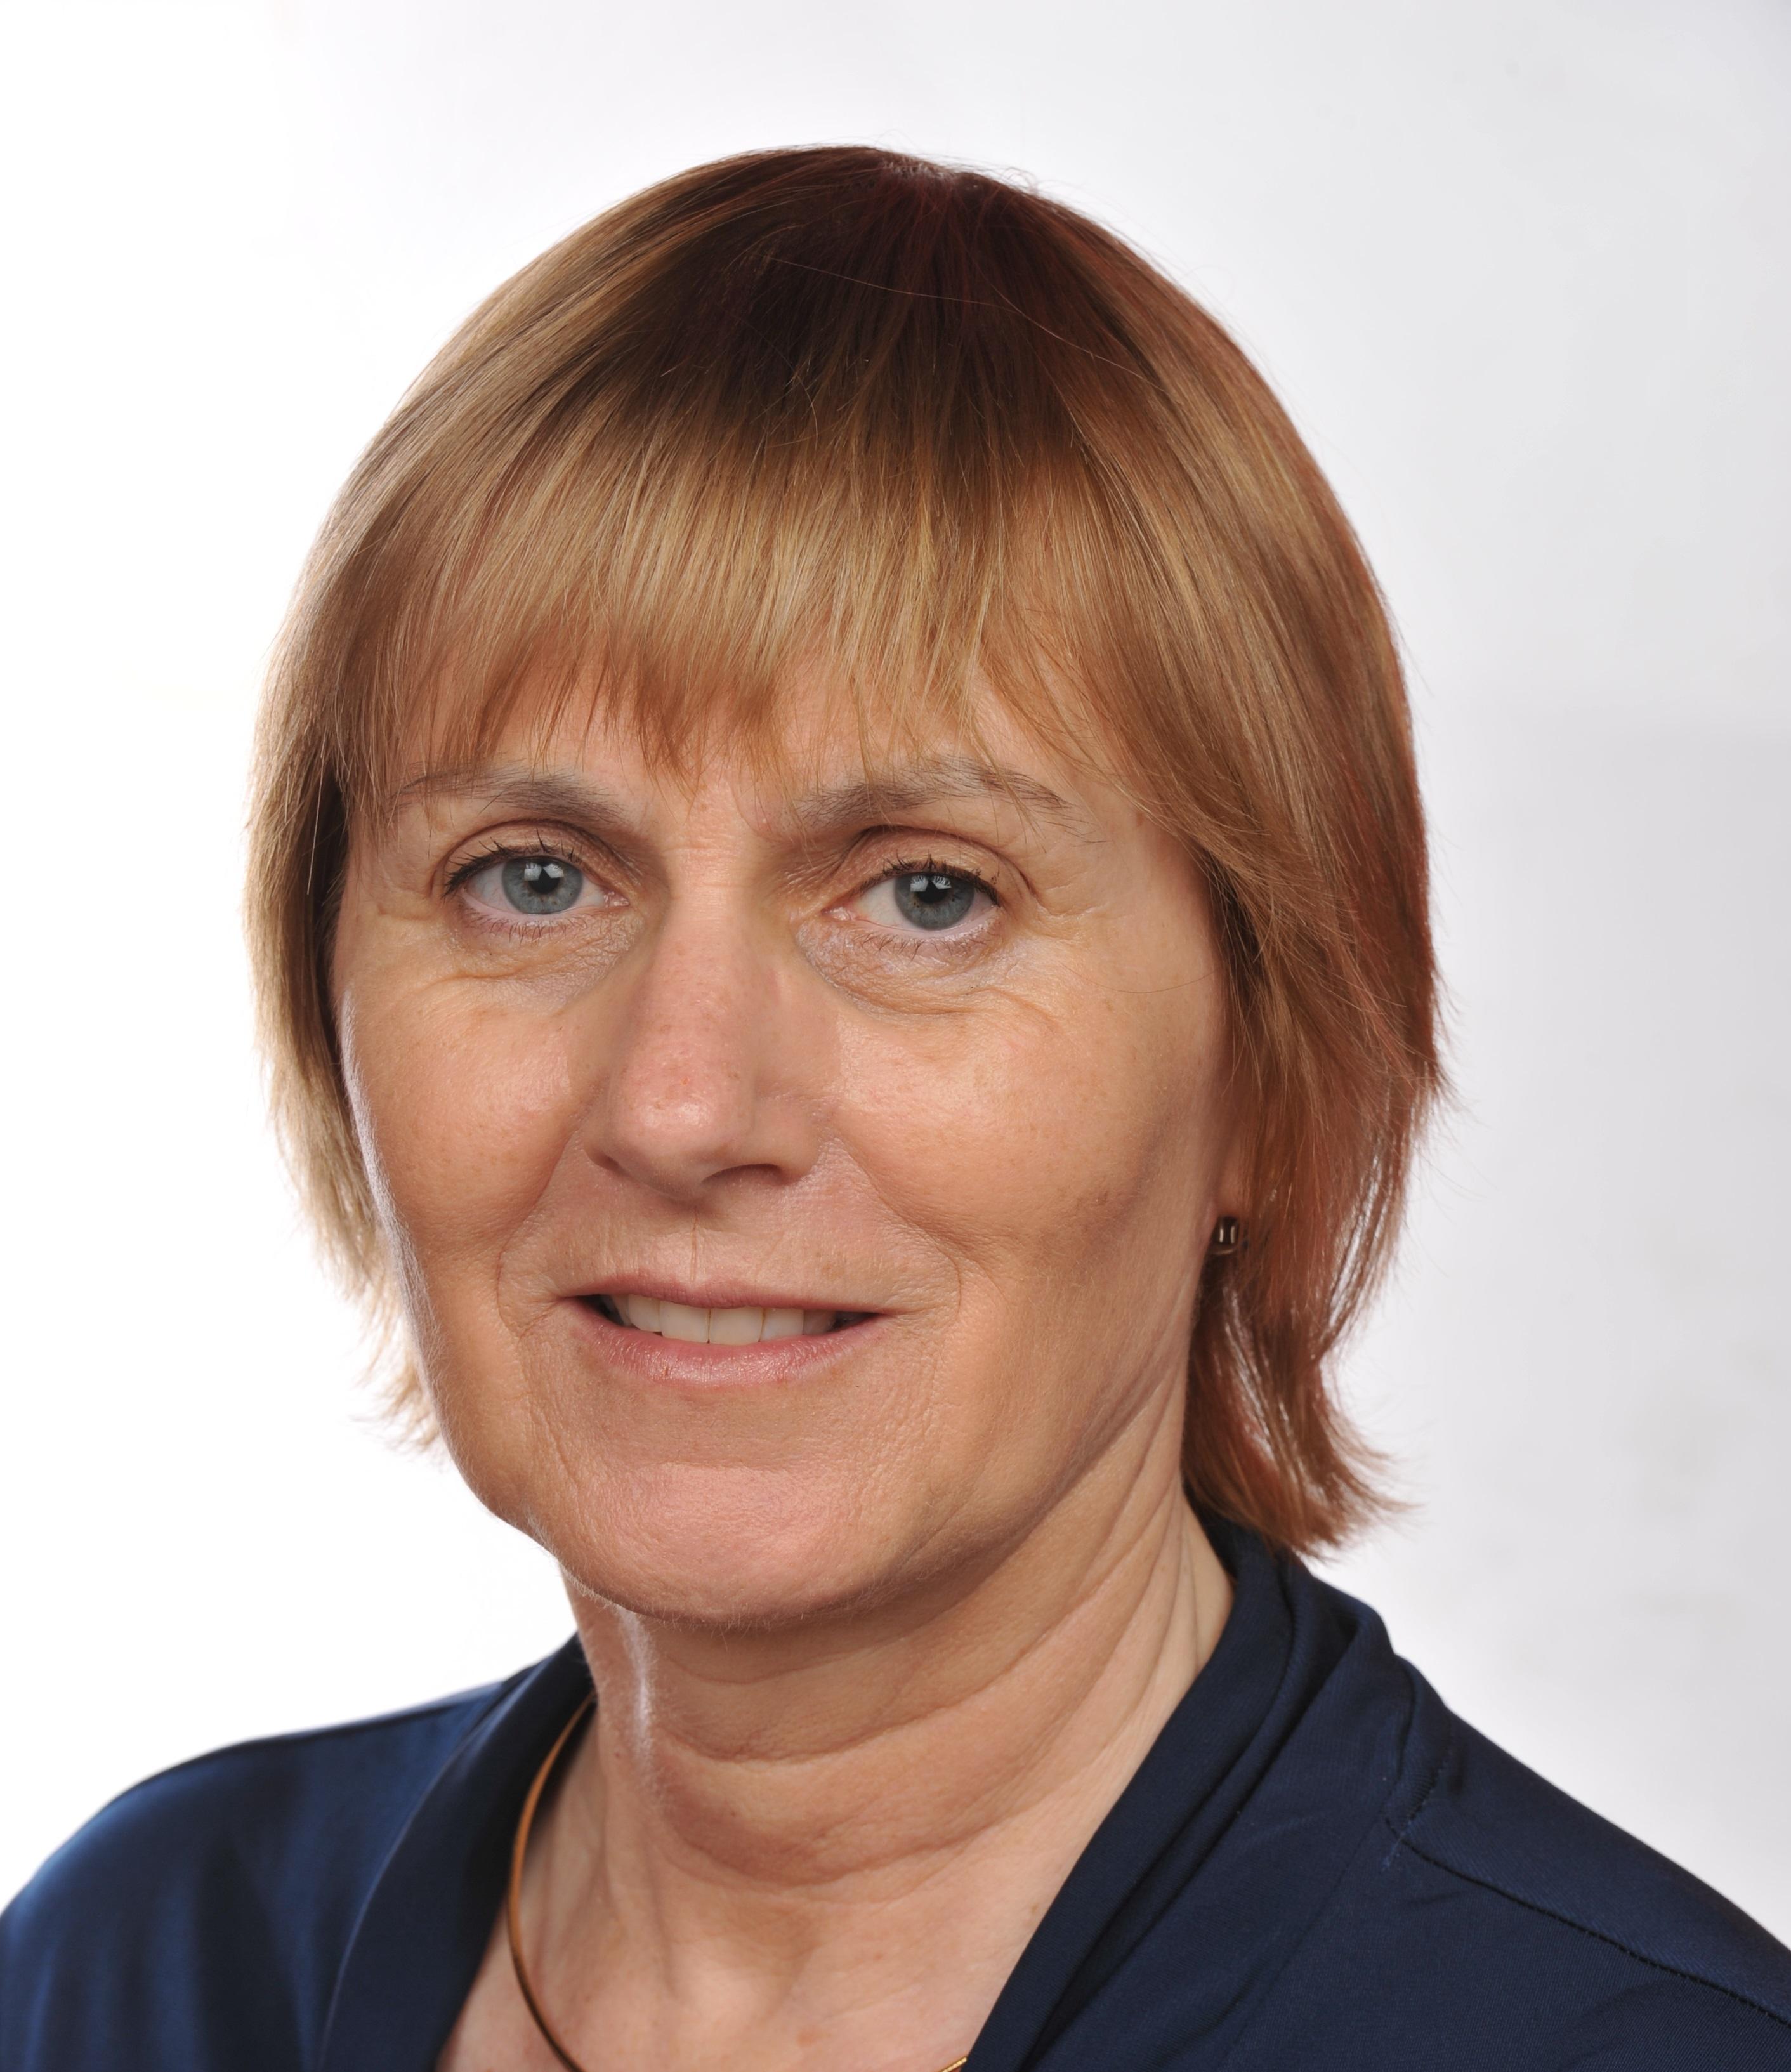 Margaret O'Keeffe